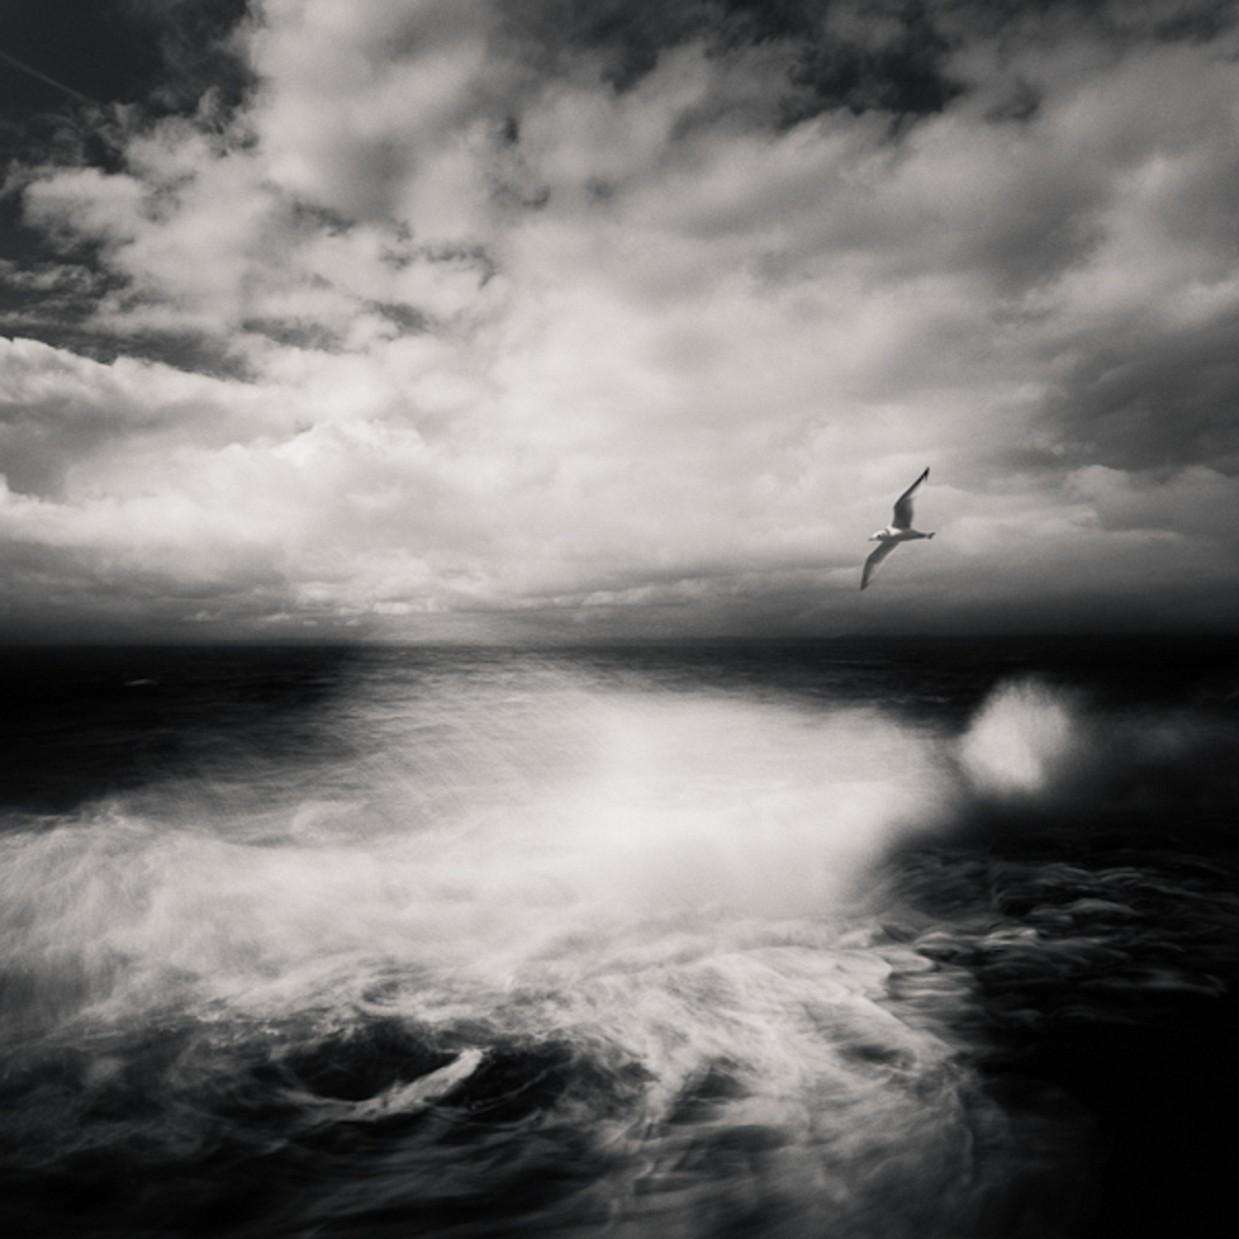 fotograf-Zoltan-Bekefi_4